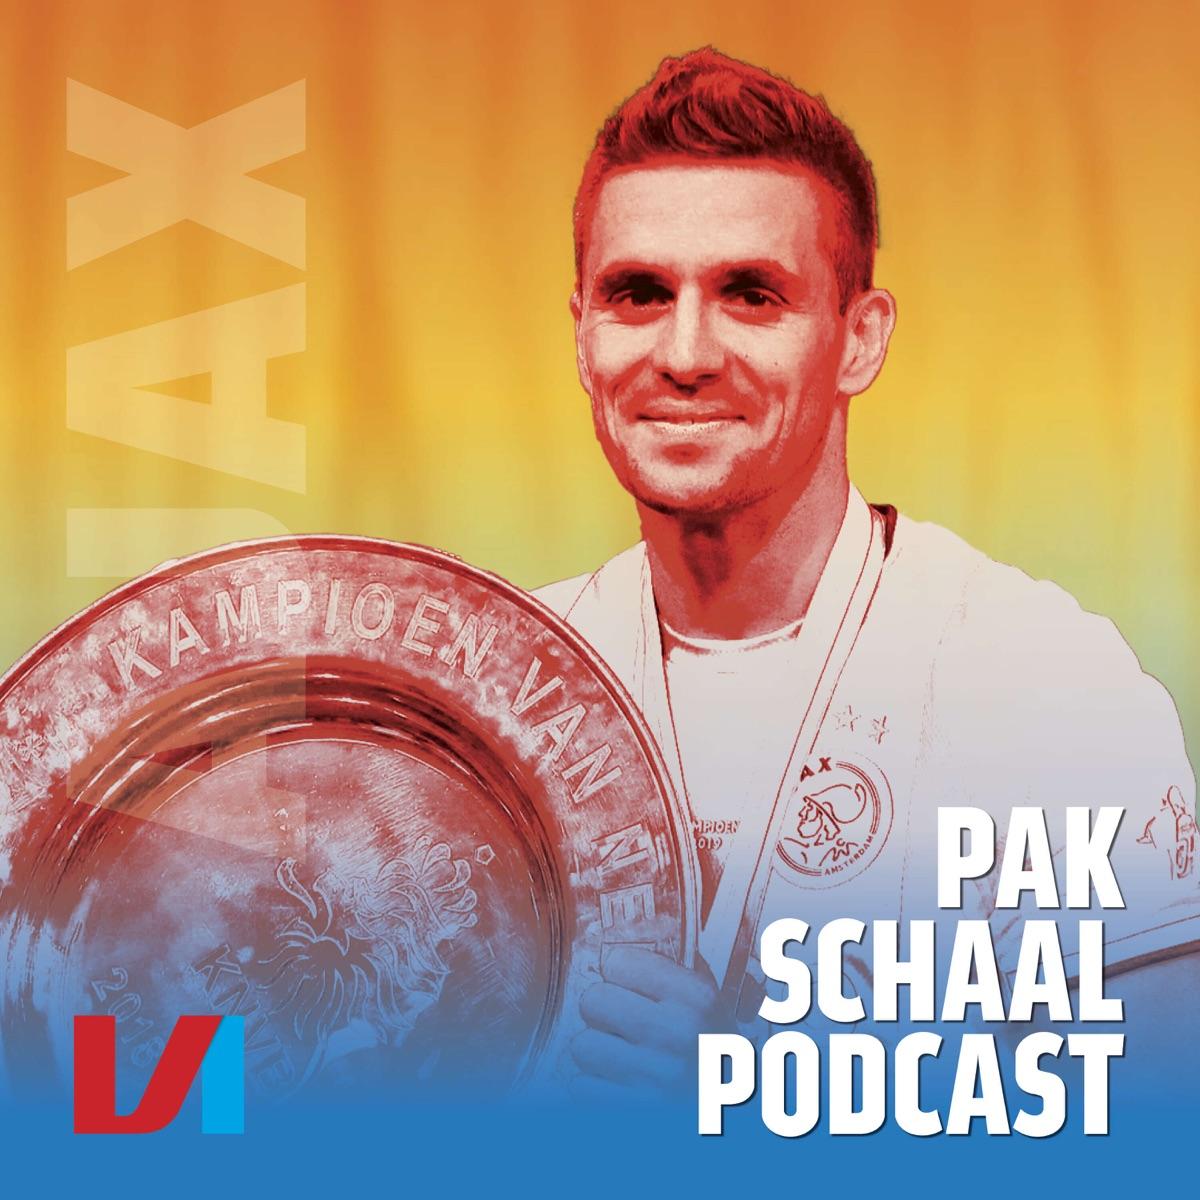 Pak Schaal Podcast